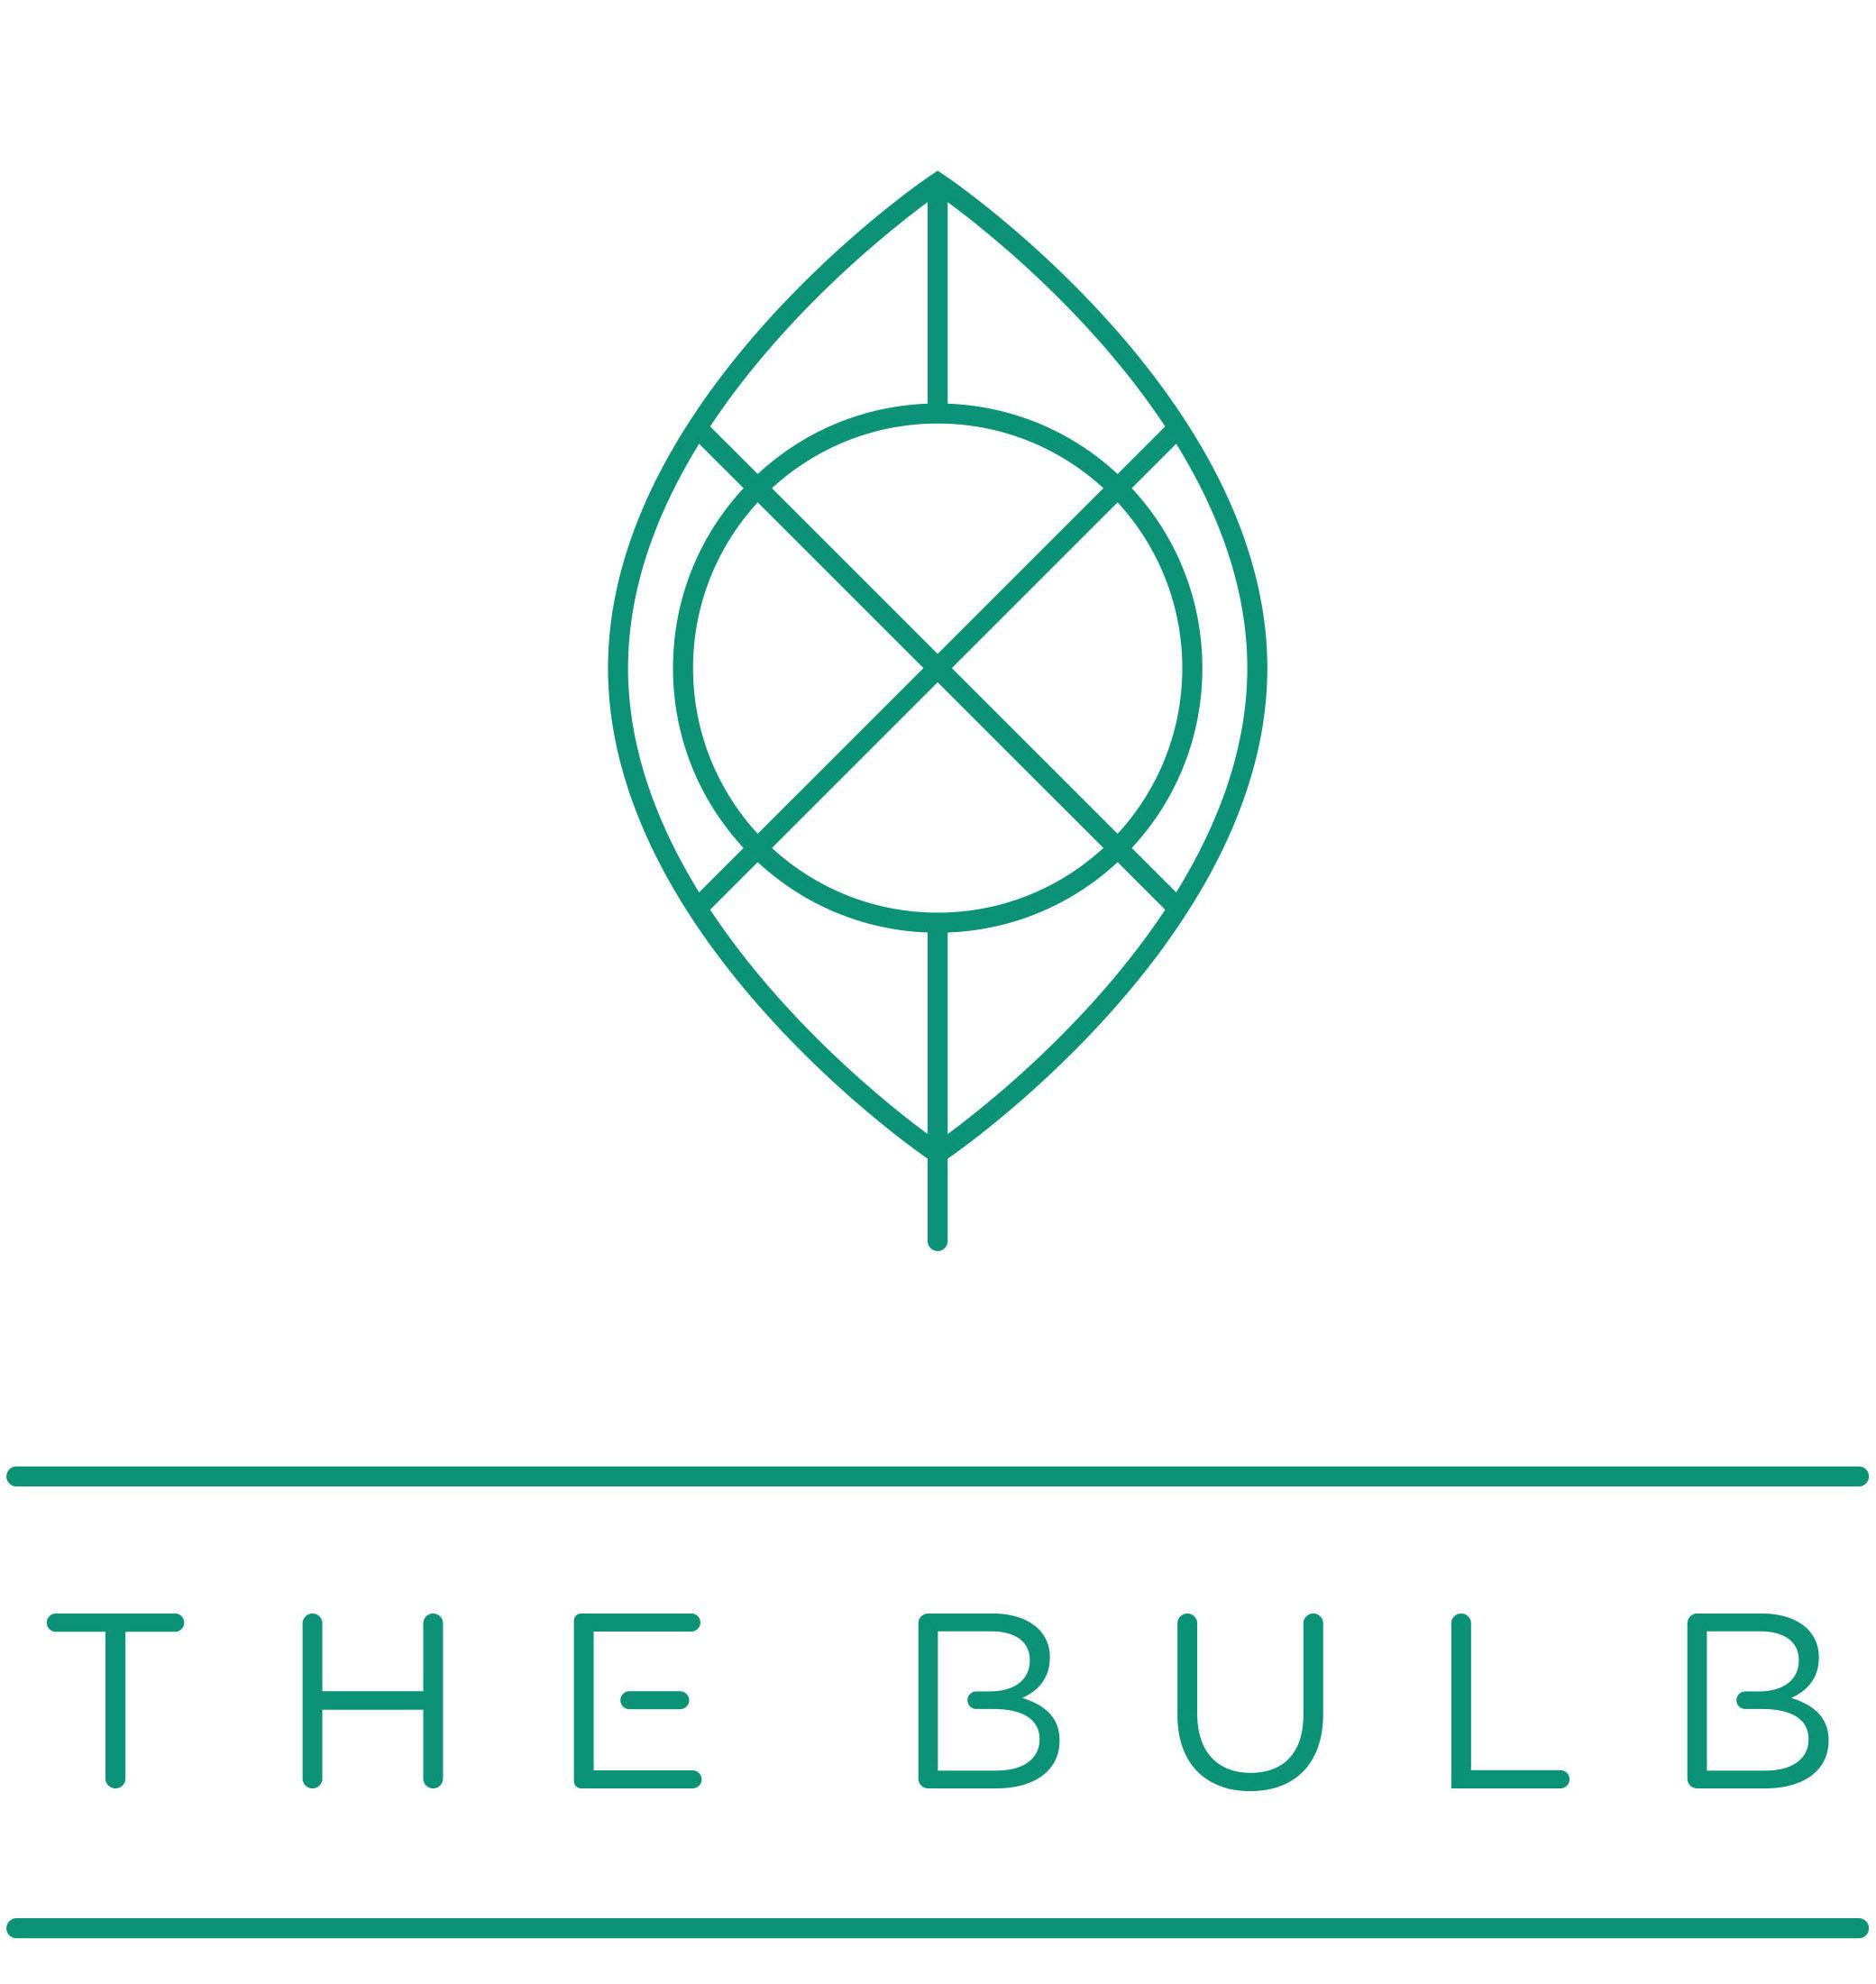 TheBulb.jpg